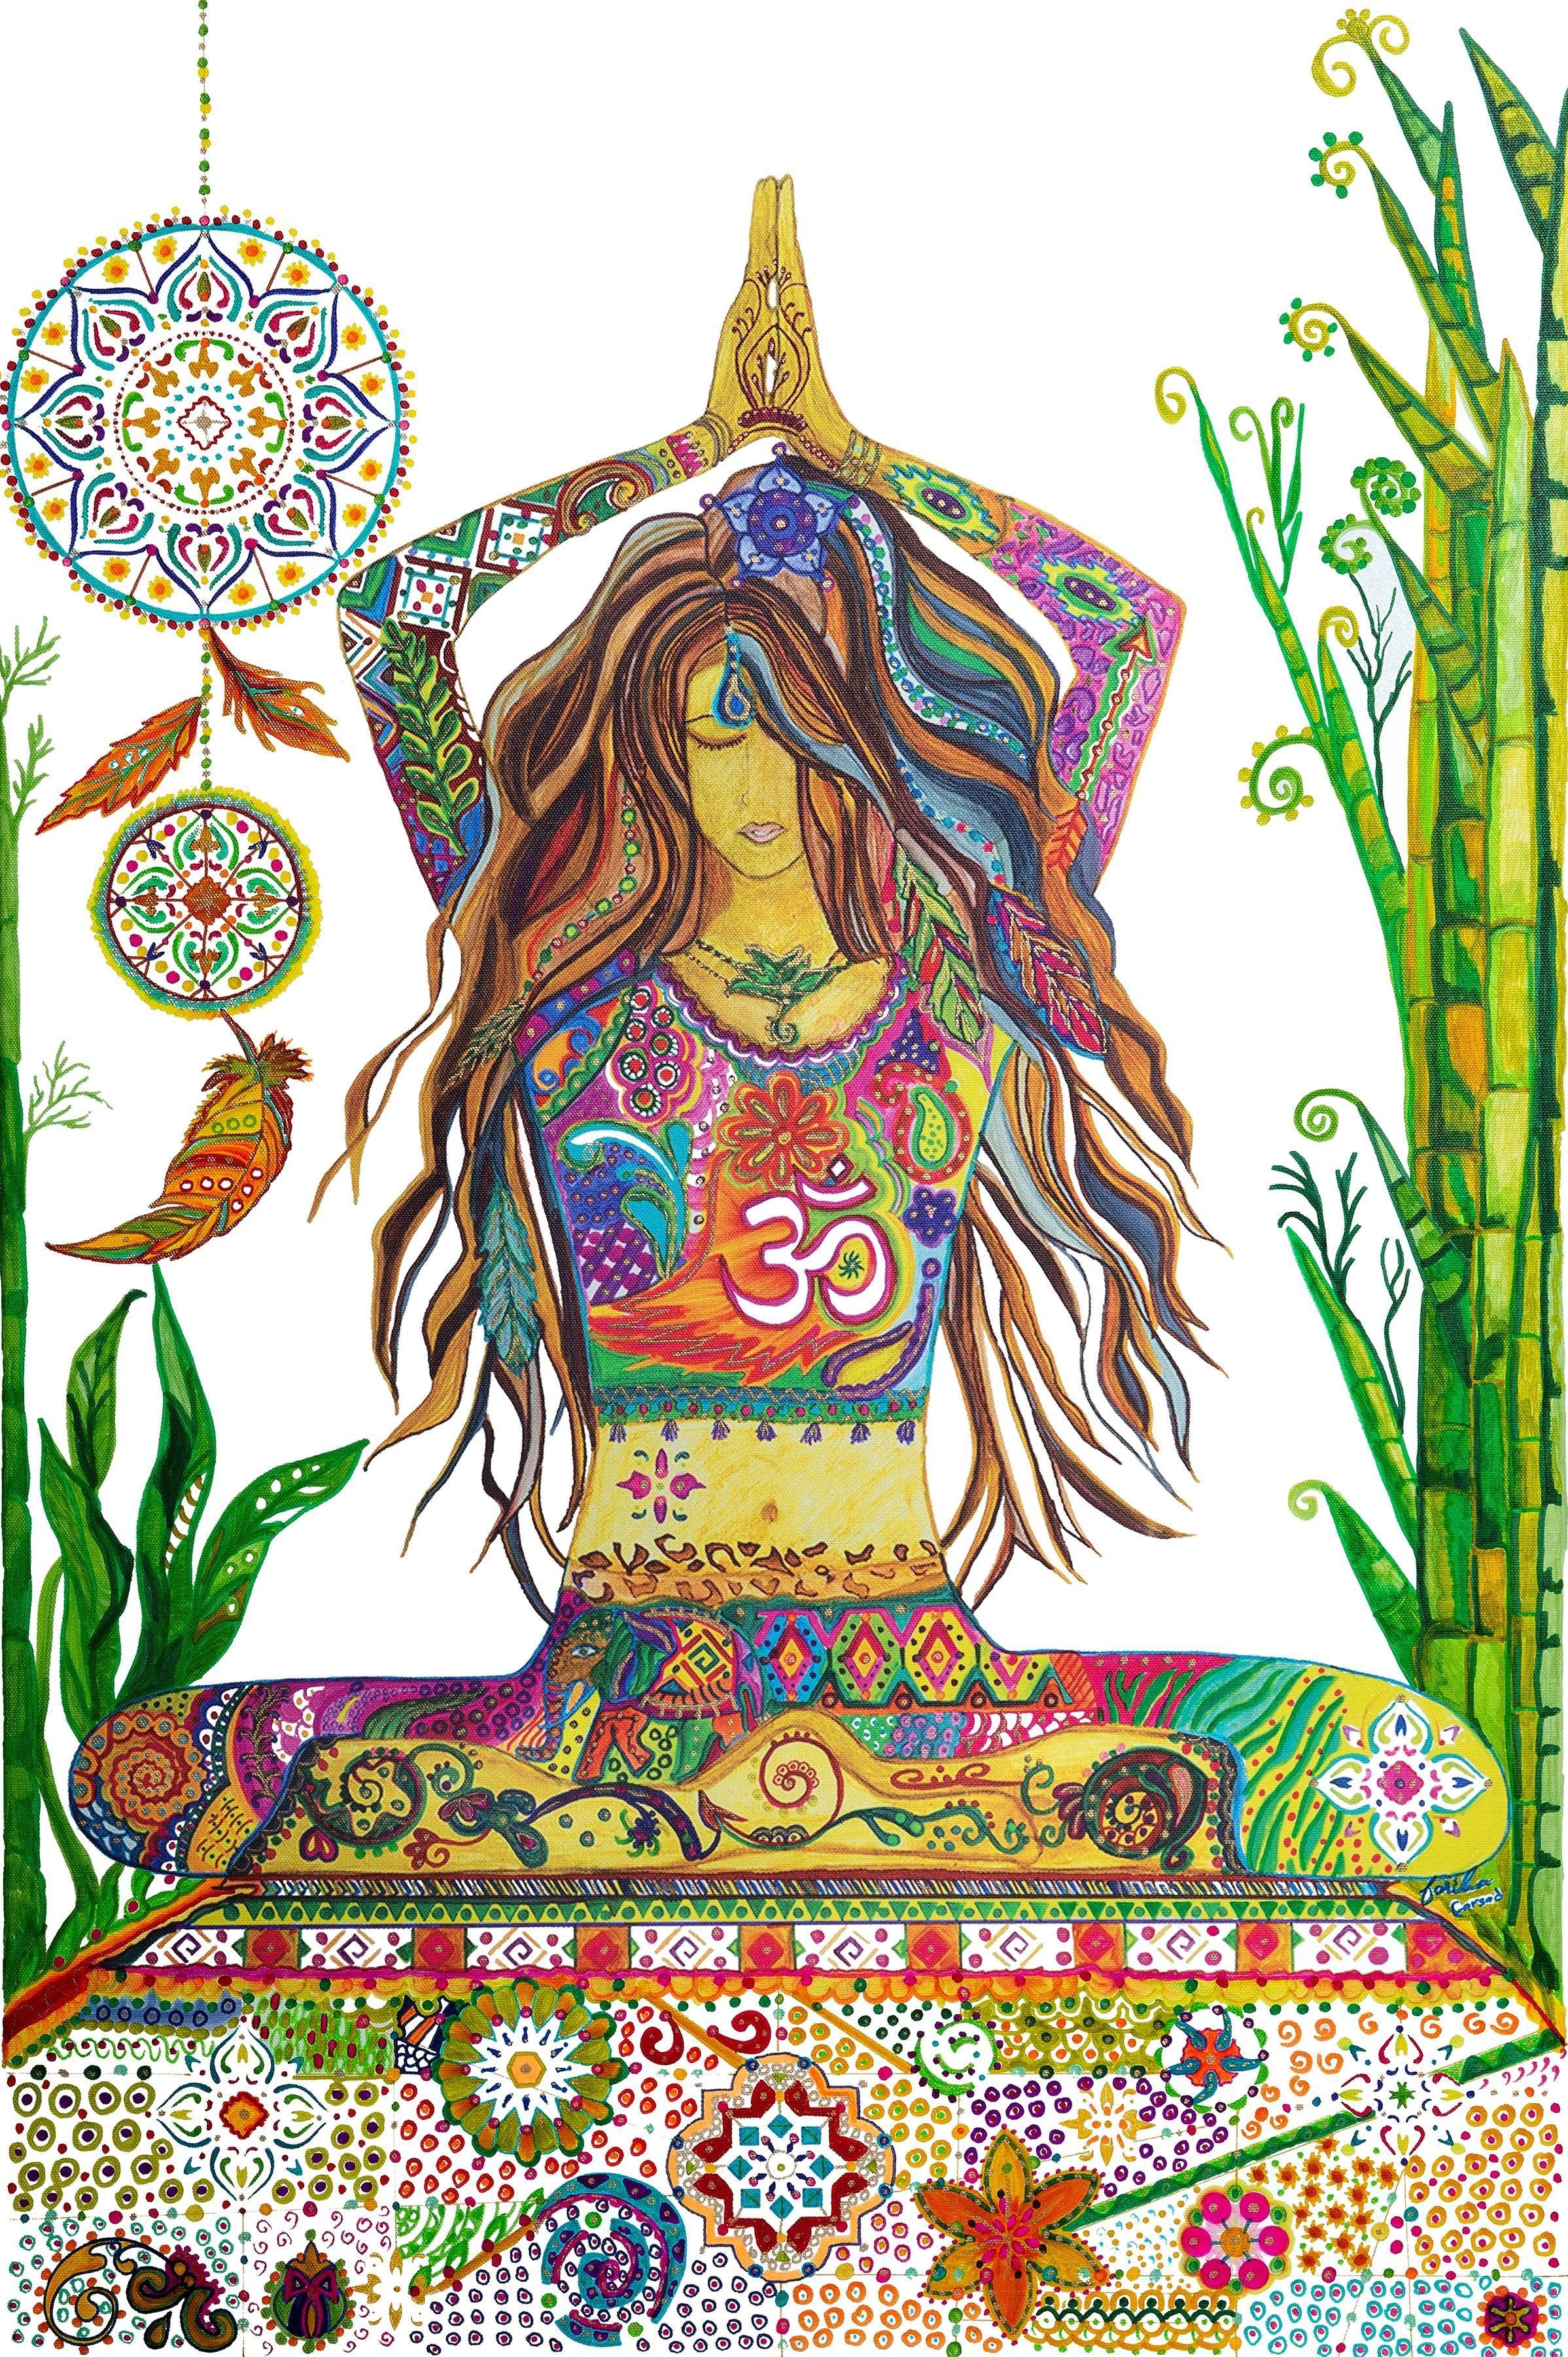 Yoga Goddess Pose Semi Original Abstract Art Painting Rolled Etsy Original Abstract Art Painting Bohemian Painting Original Abstract Art